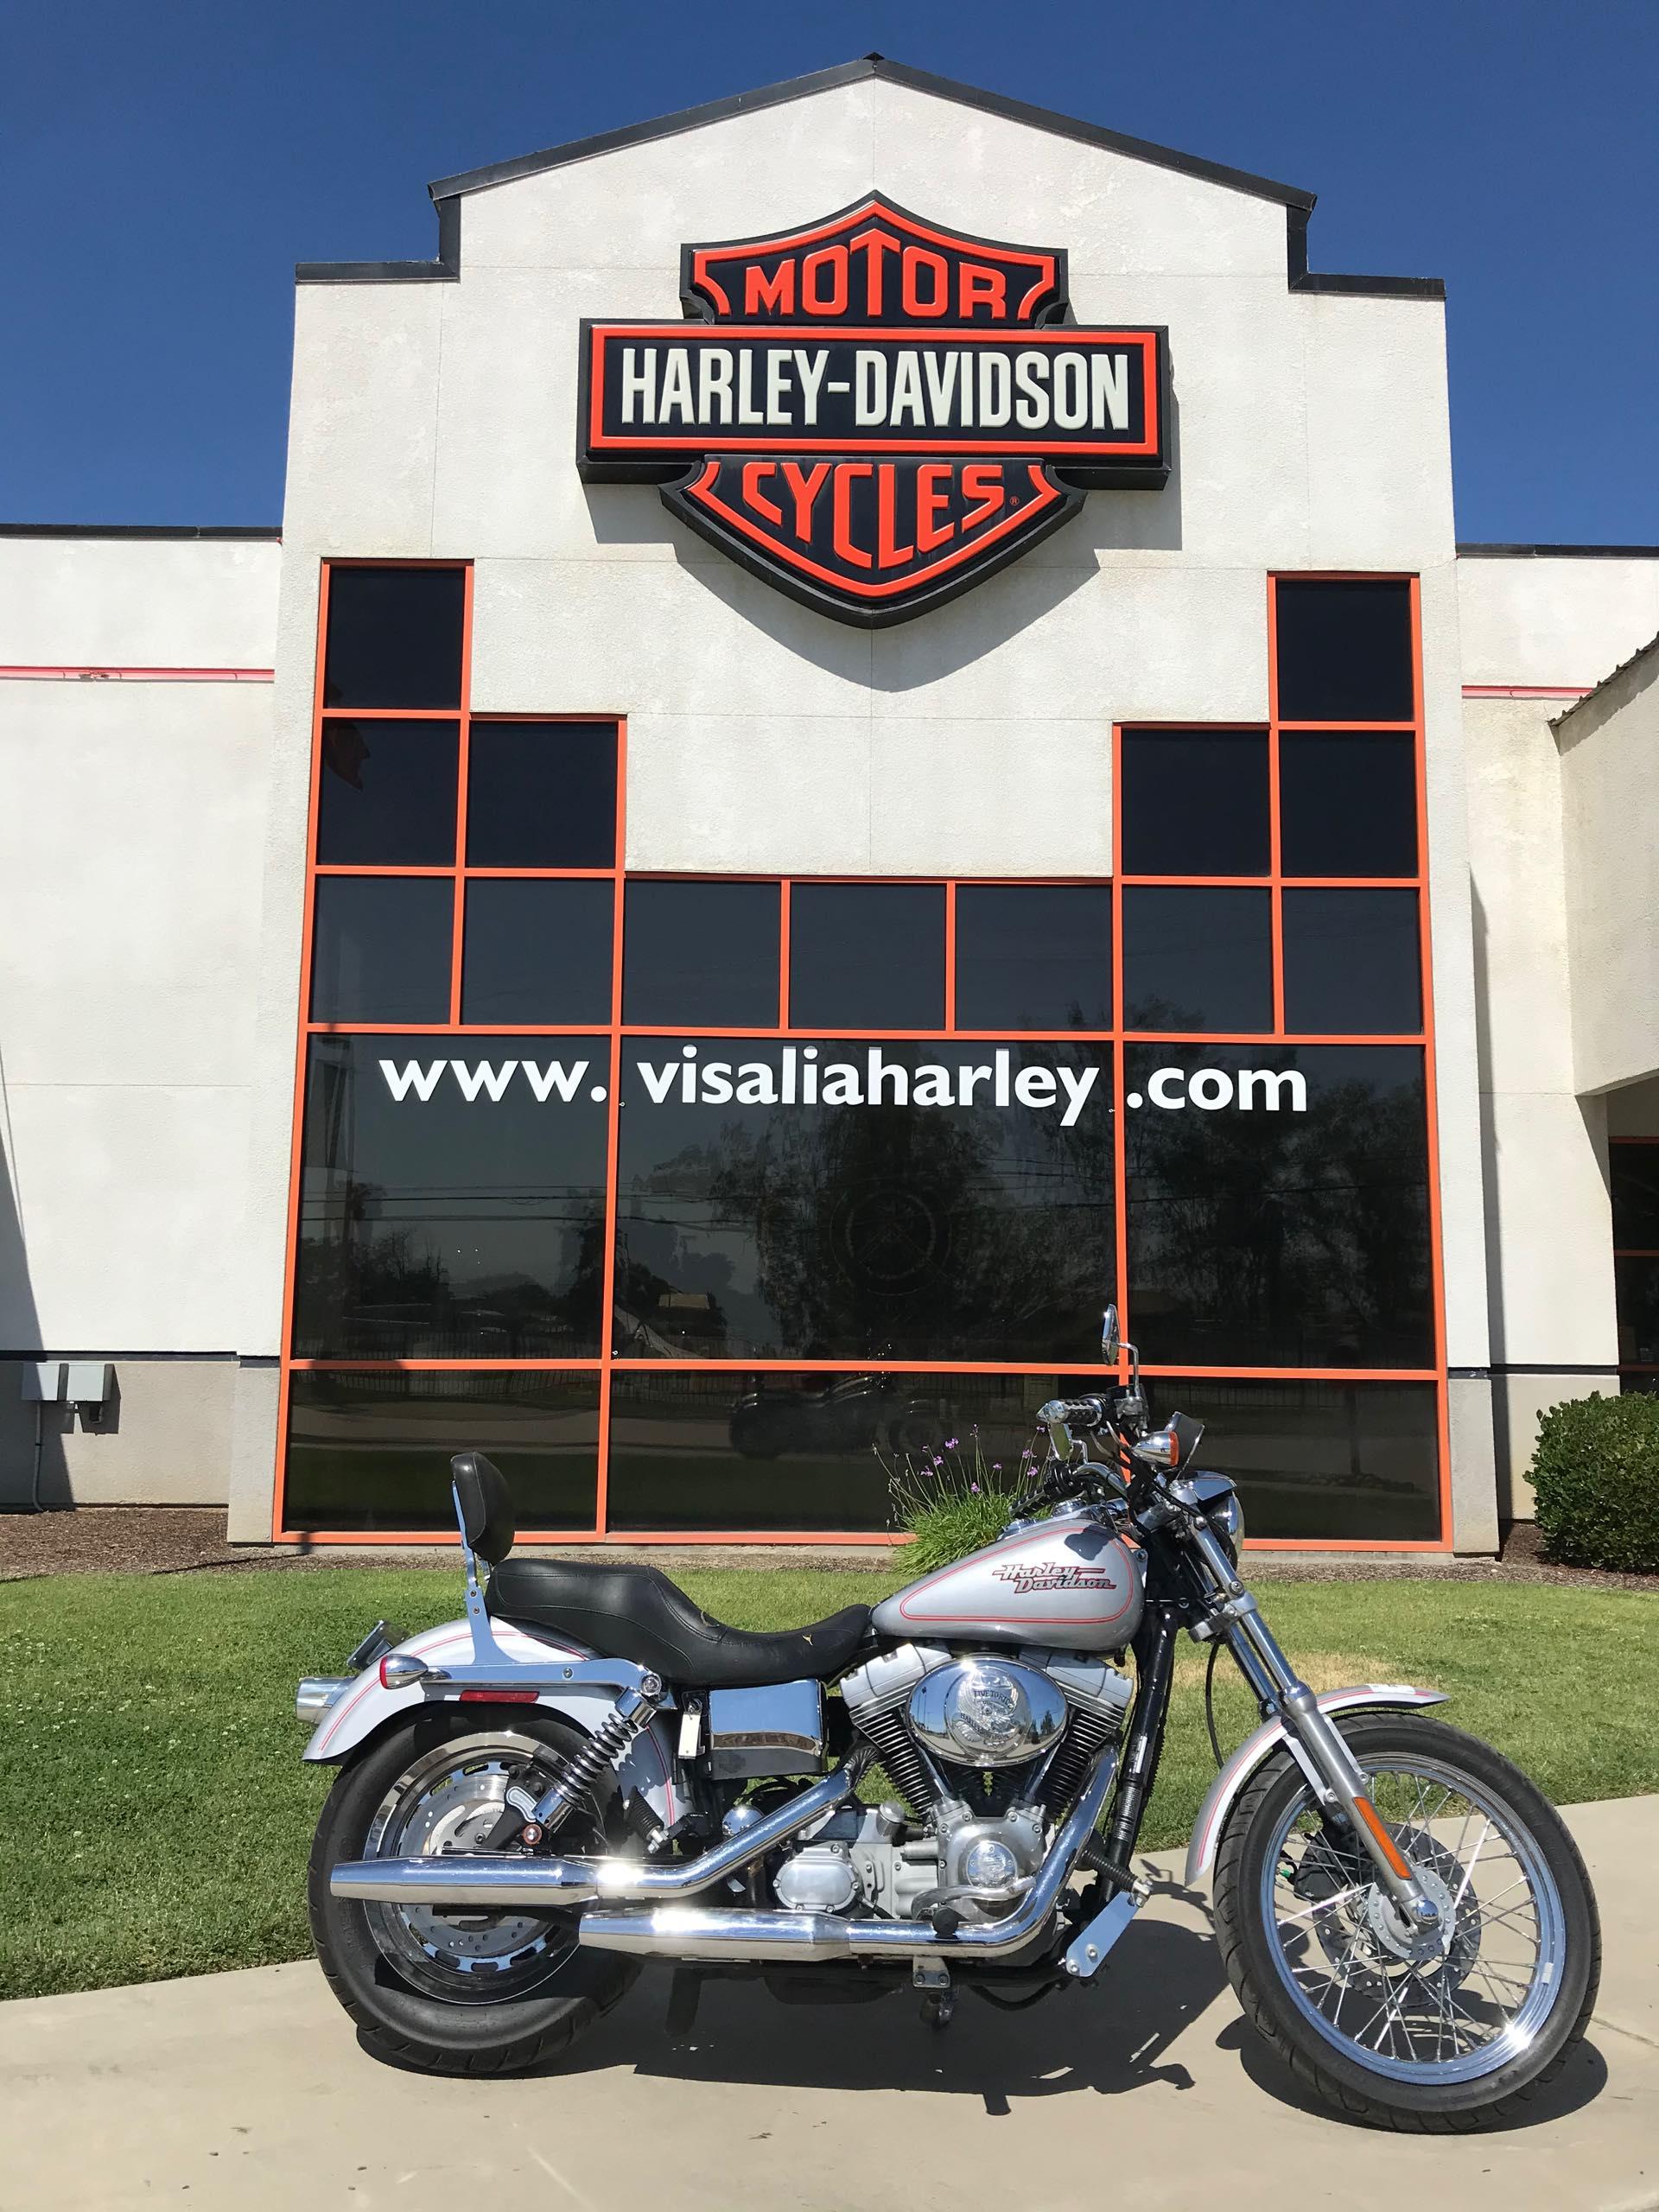 2002 Harley-Davidson FXD DYNA at Visalia Harley-Davidson